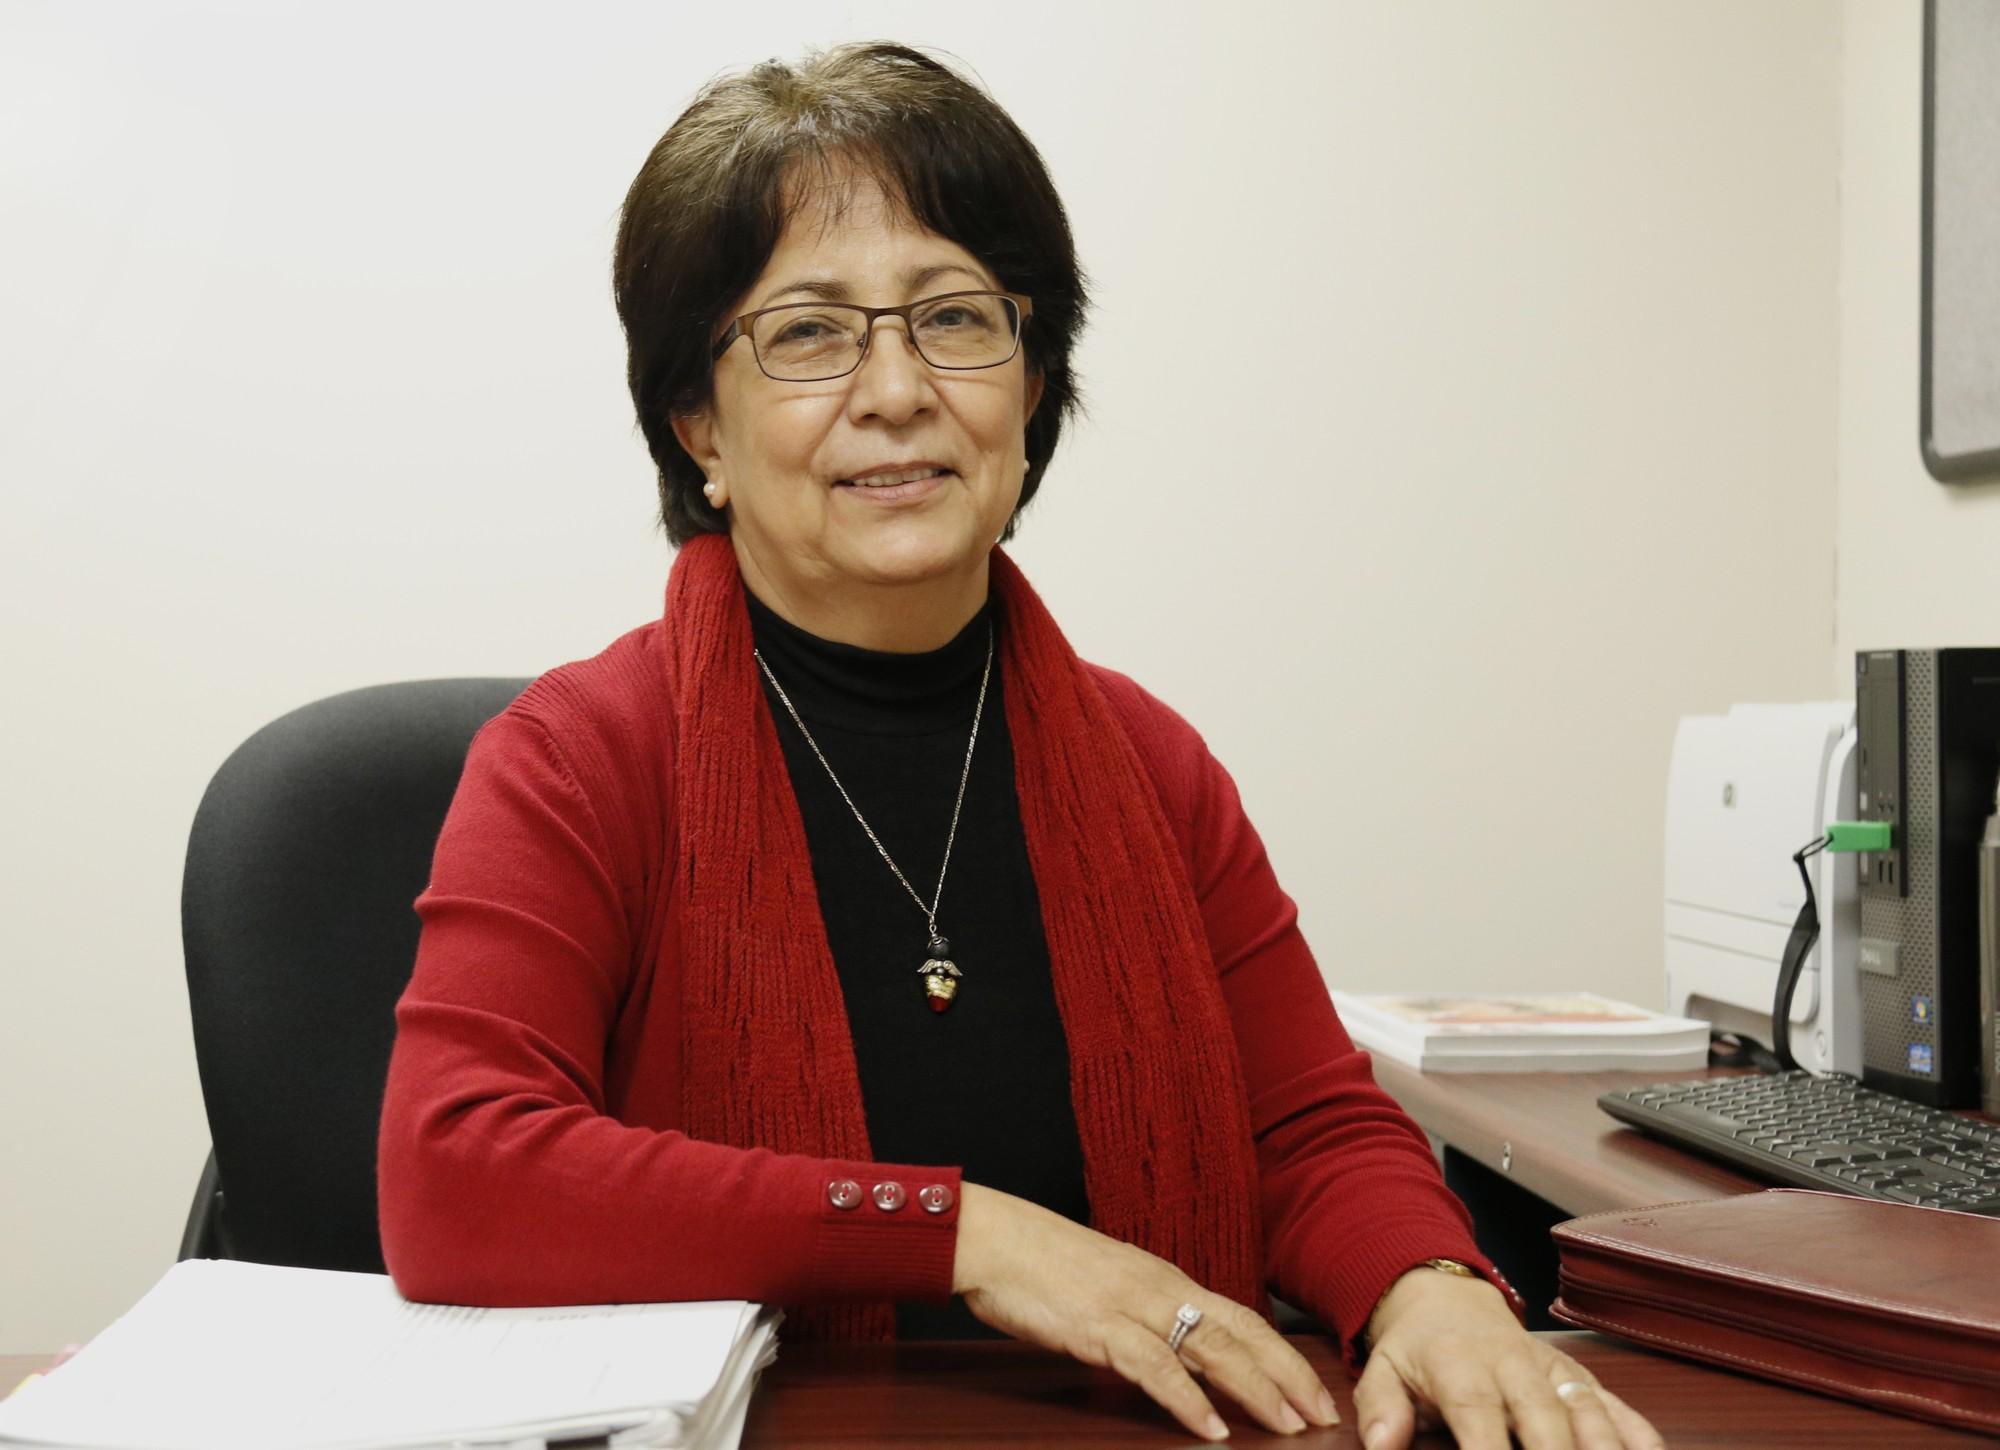 photo shows Juana Mora sitting at her desk